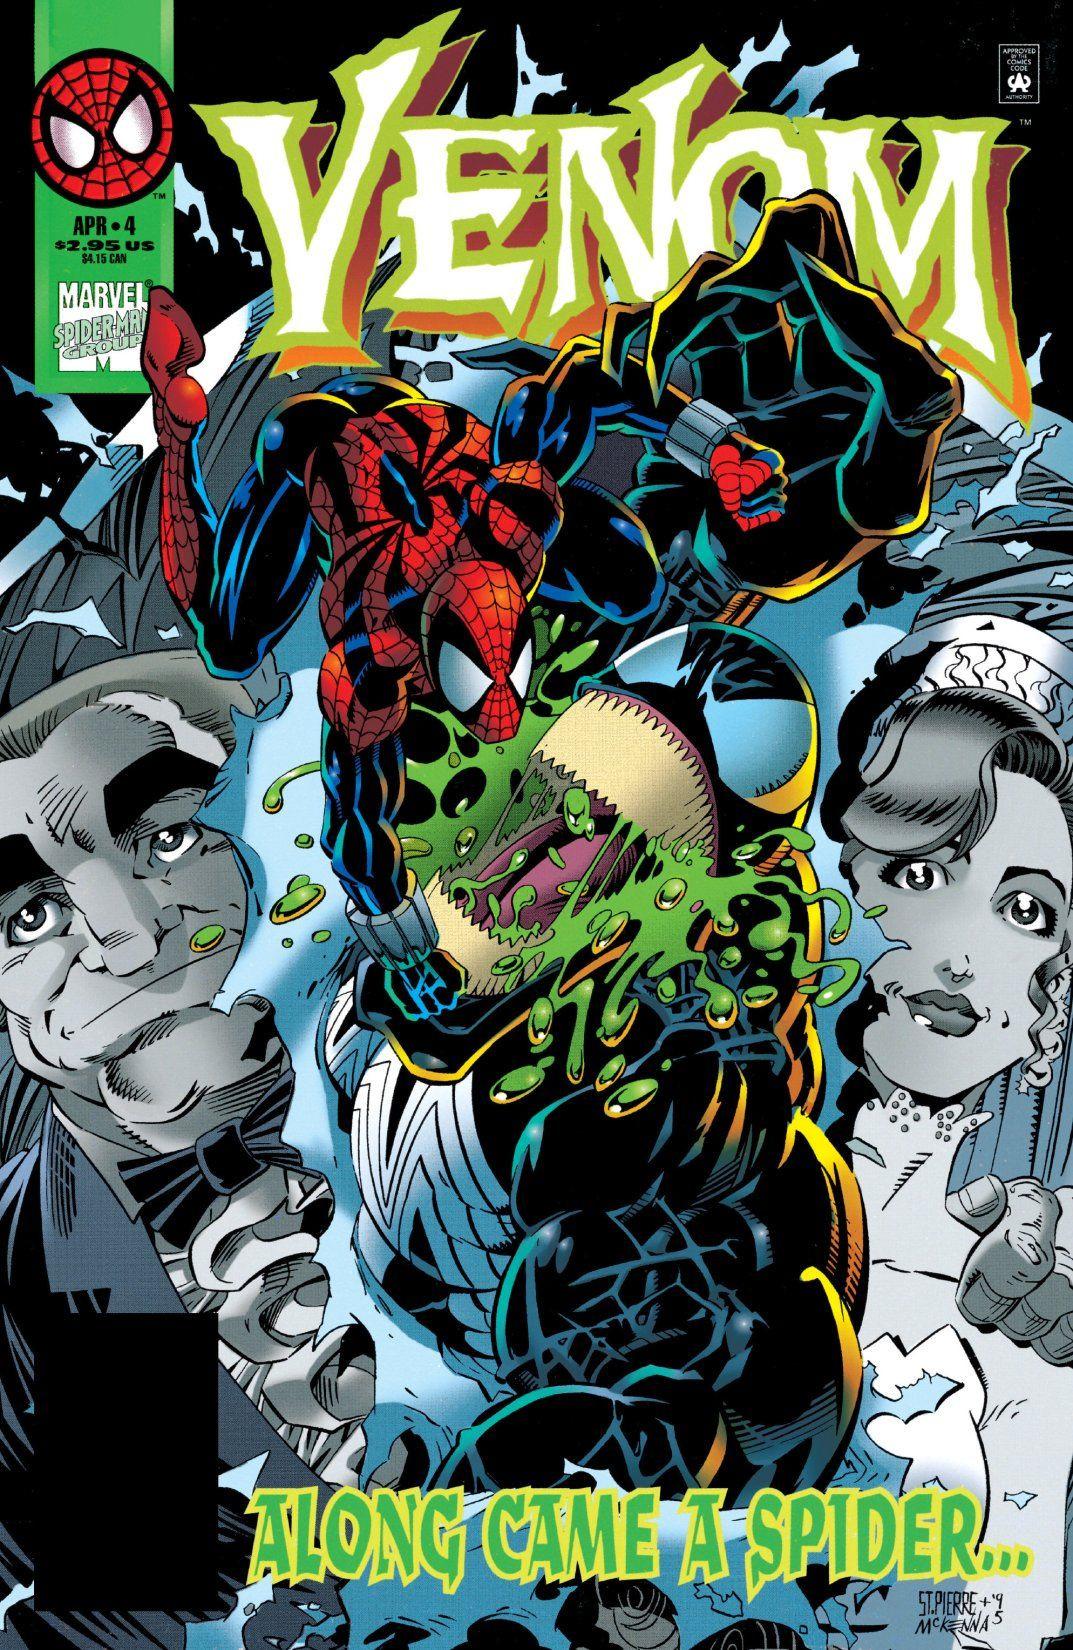 Venom Hosts / Characters - TV Tropes